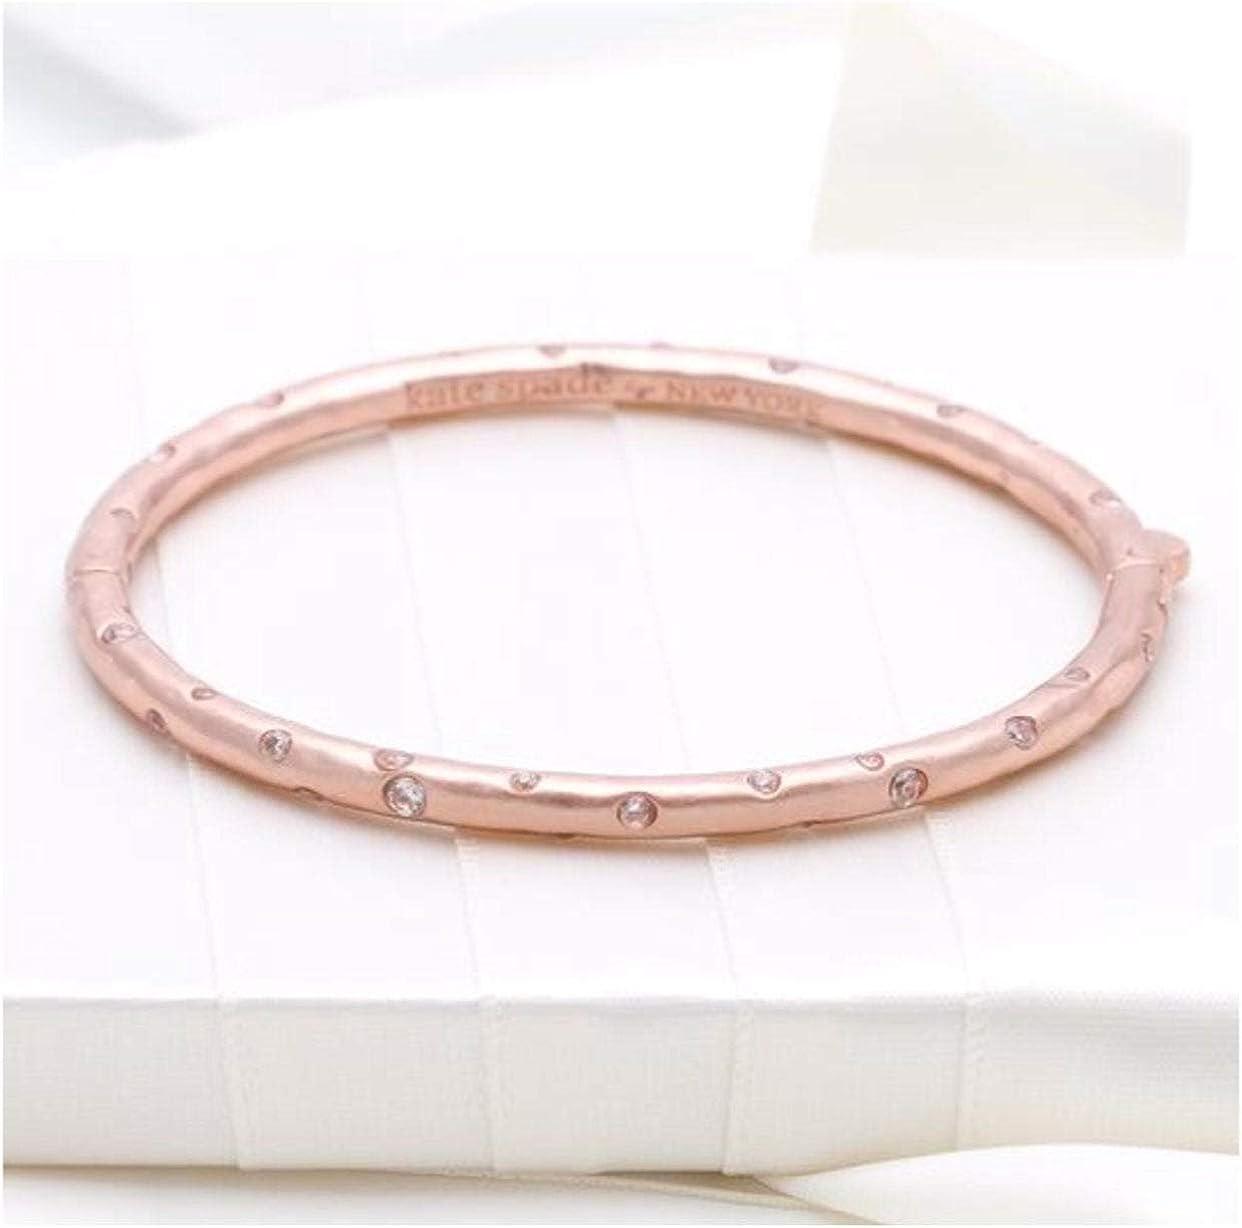 Kate Spade New York Bangle Bracelet (Elegant Edge O0RU2898)